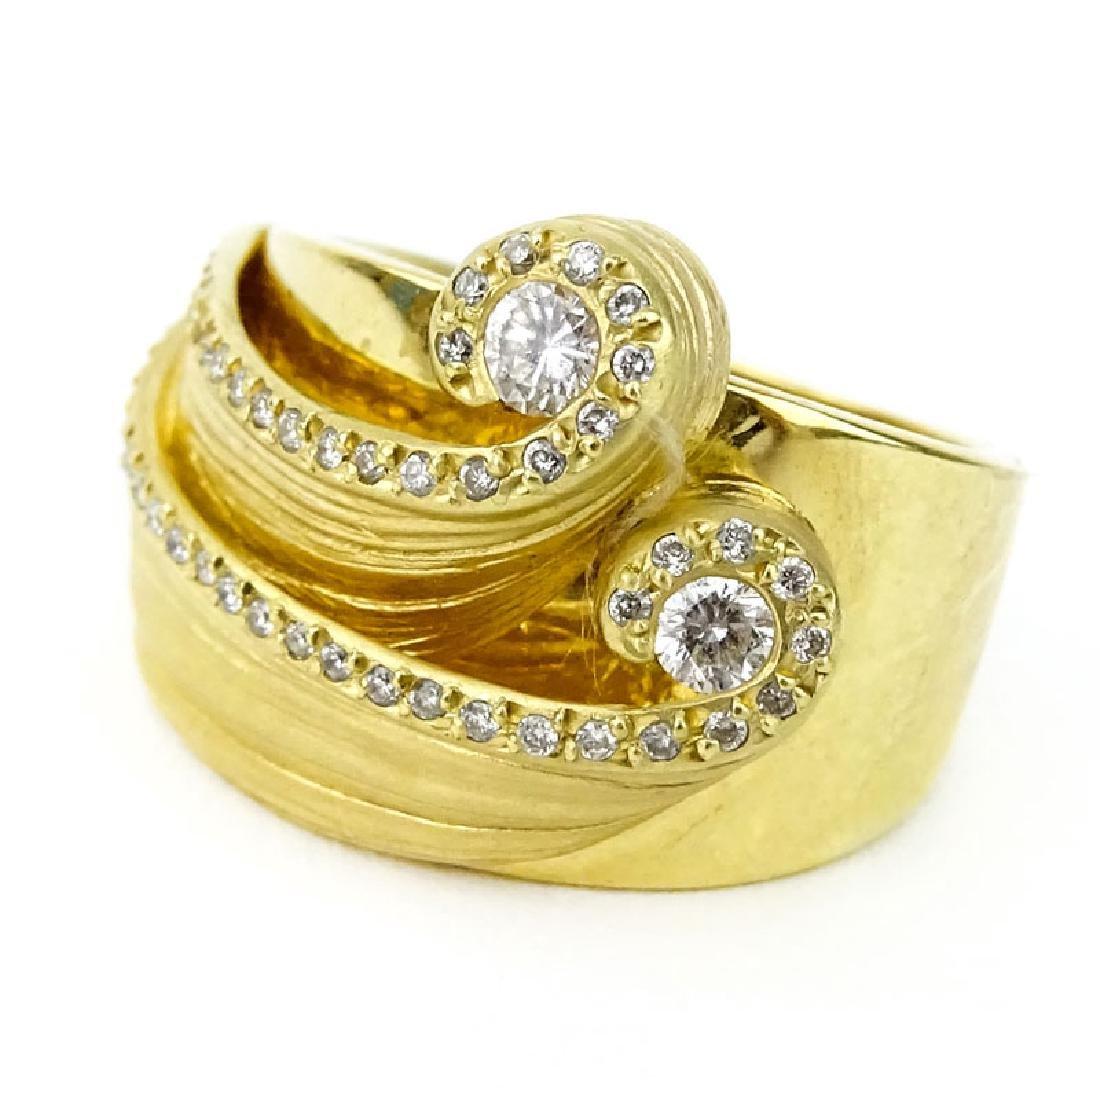 Vancox Approx. .75 Carat Diamond and 18 Karat Yellow